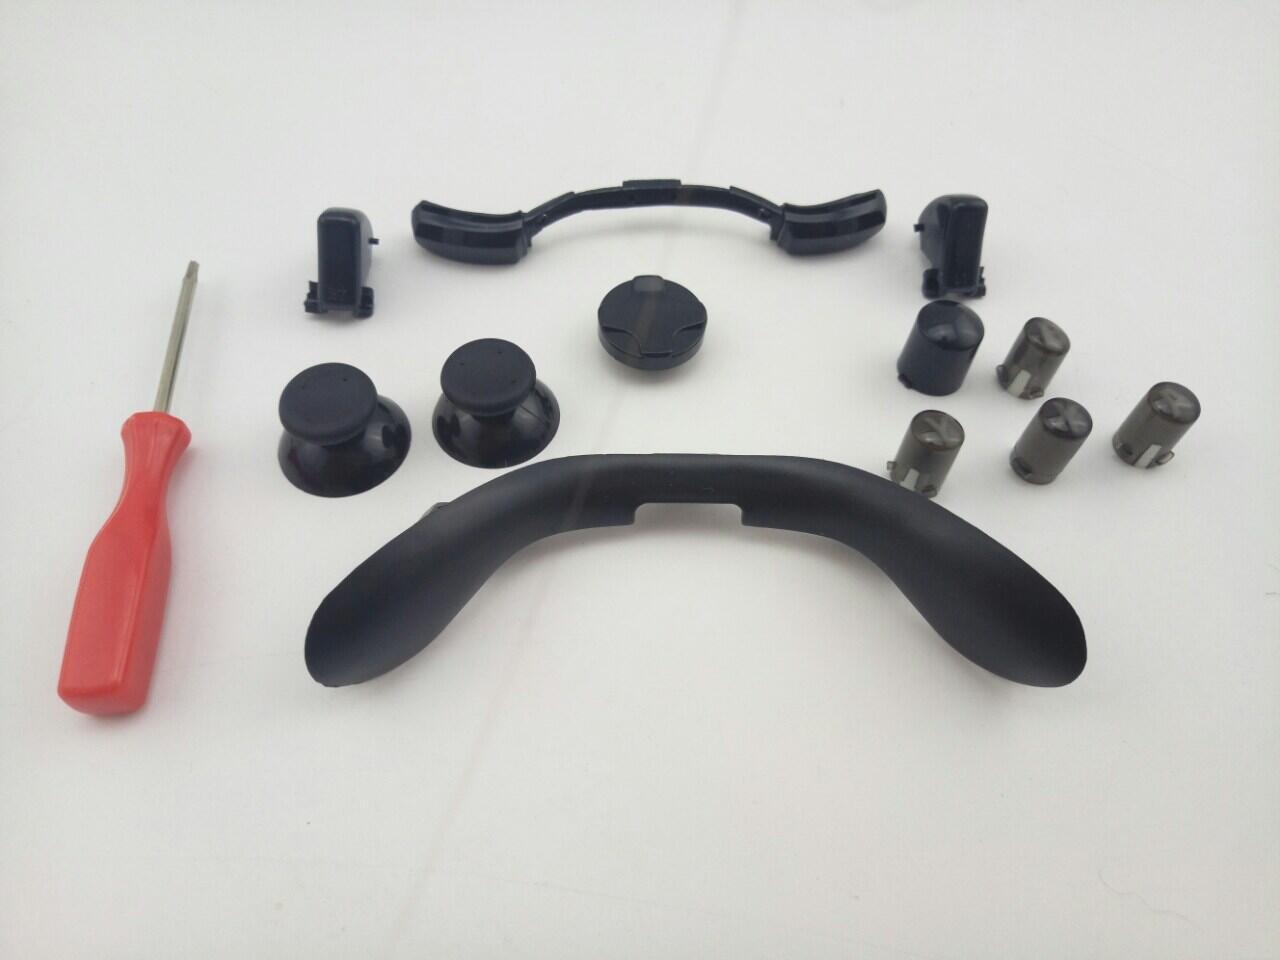 Ремонтный комплект для джойстика XBOX 360 N1-thumb